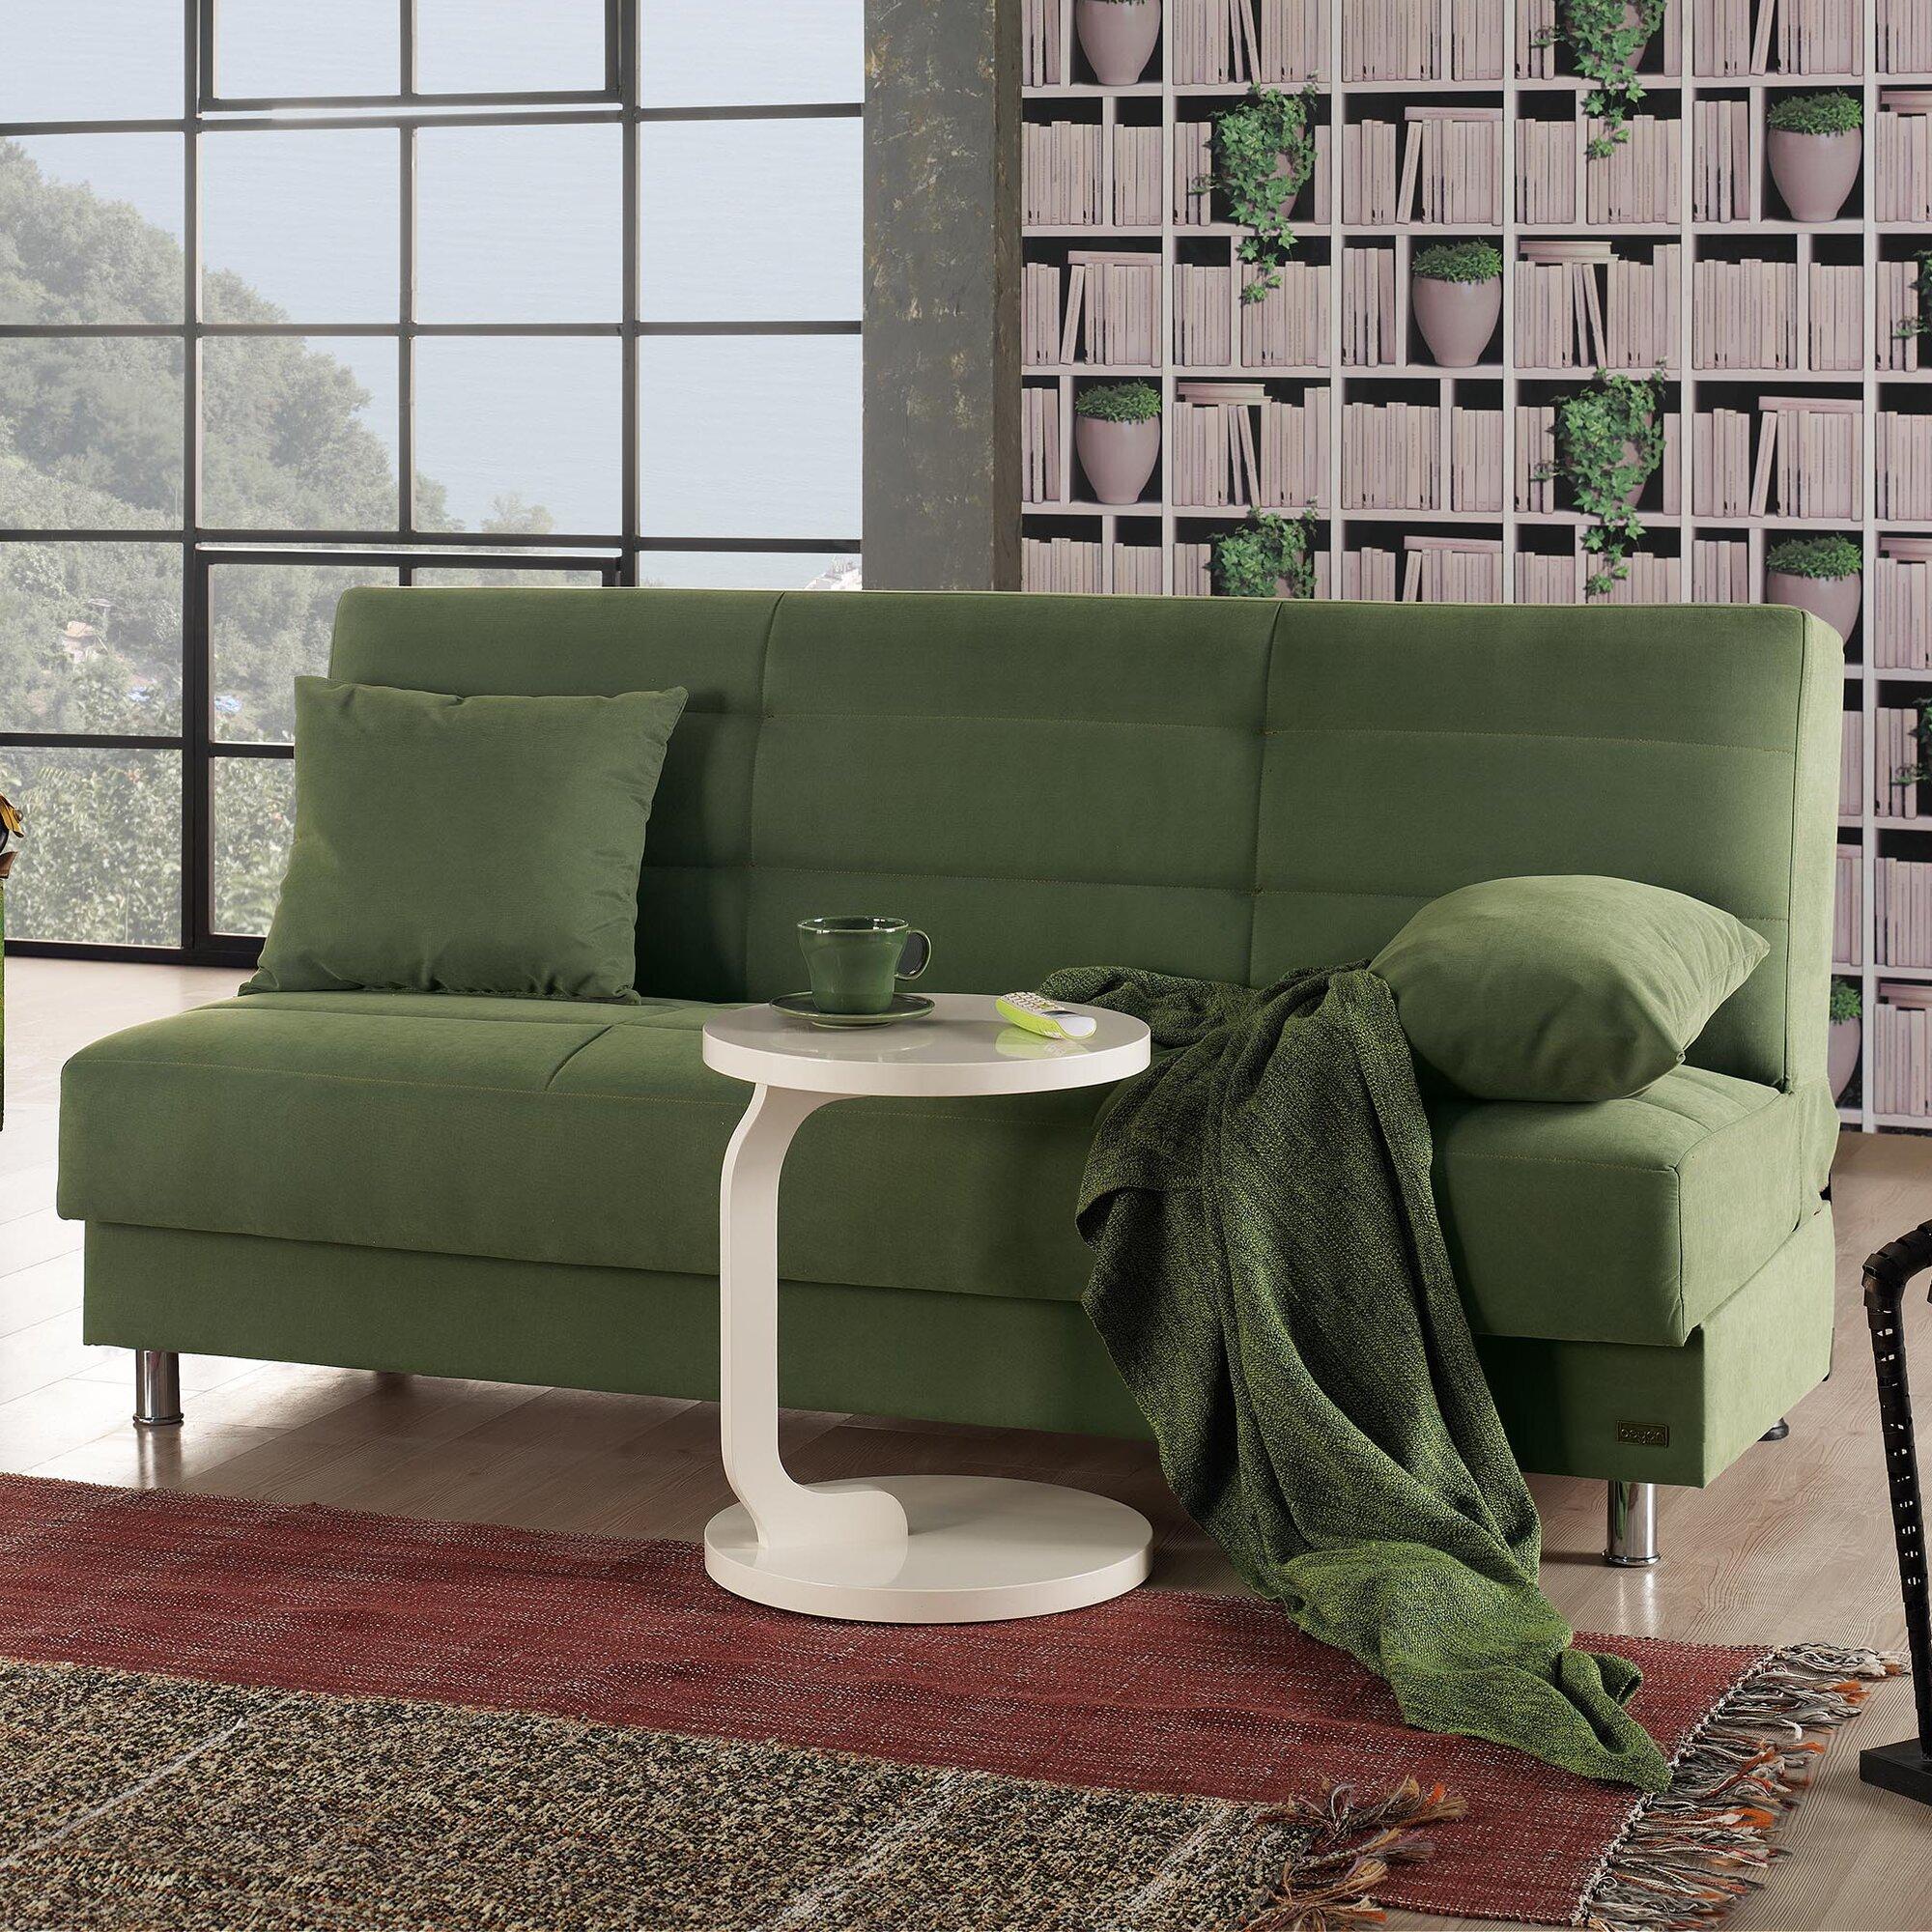 Beyan Signature Atlanta Sleeper Sofa Our Sku Bysn1207 Mpn Sb